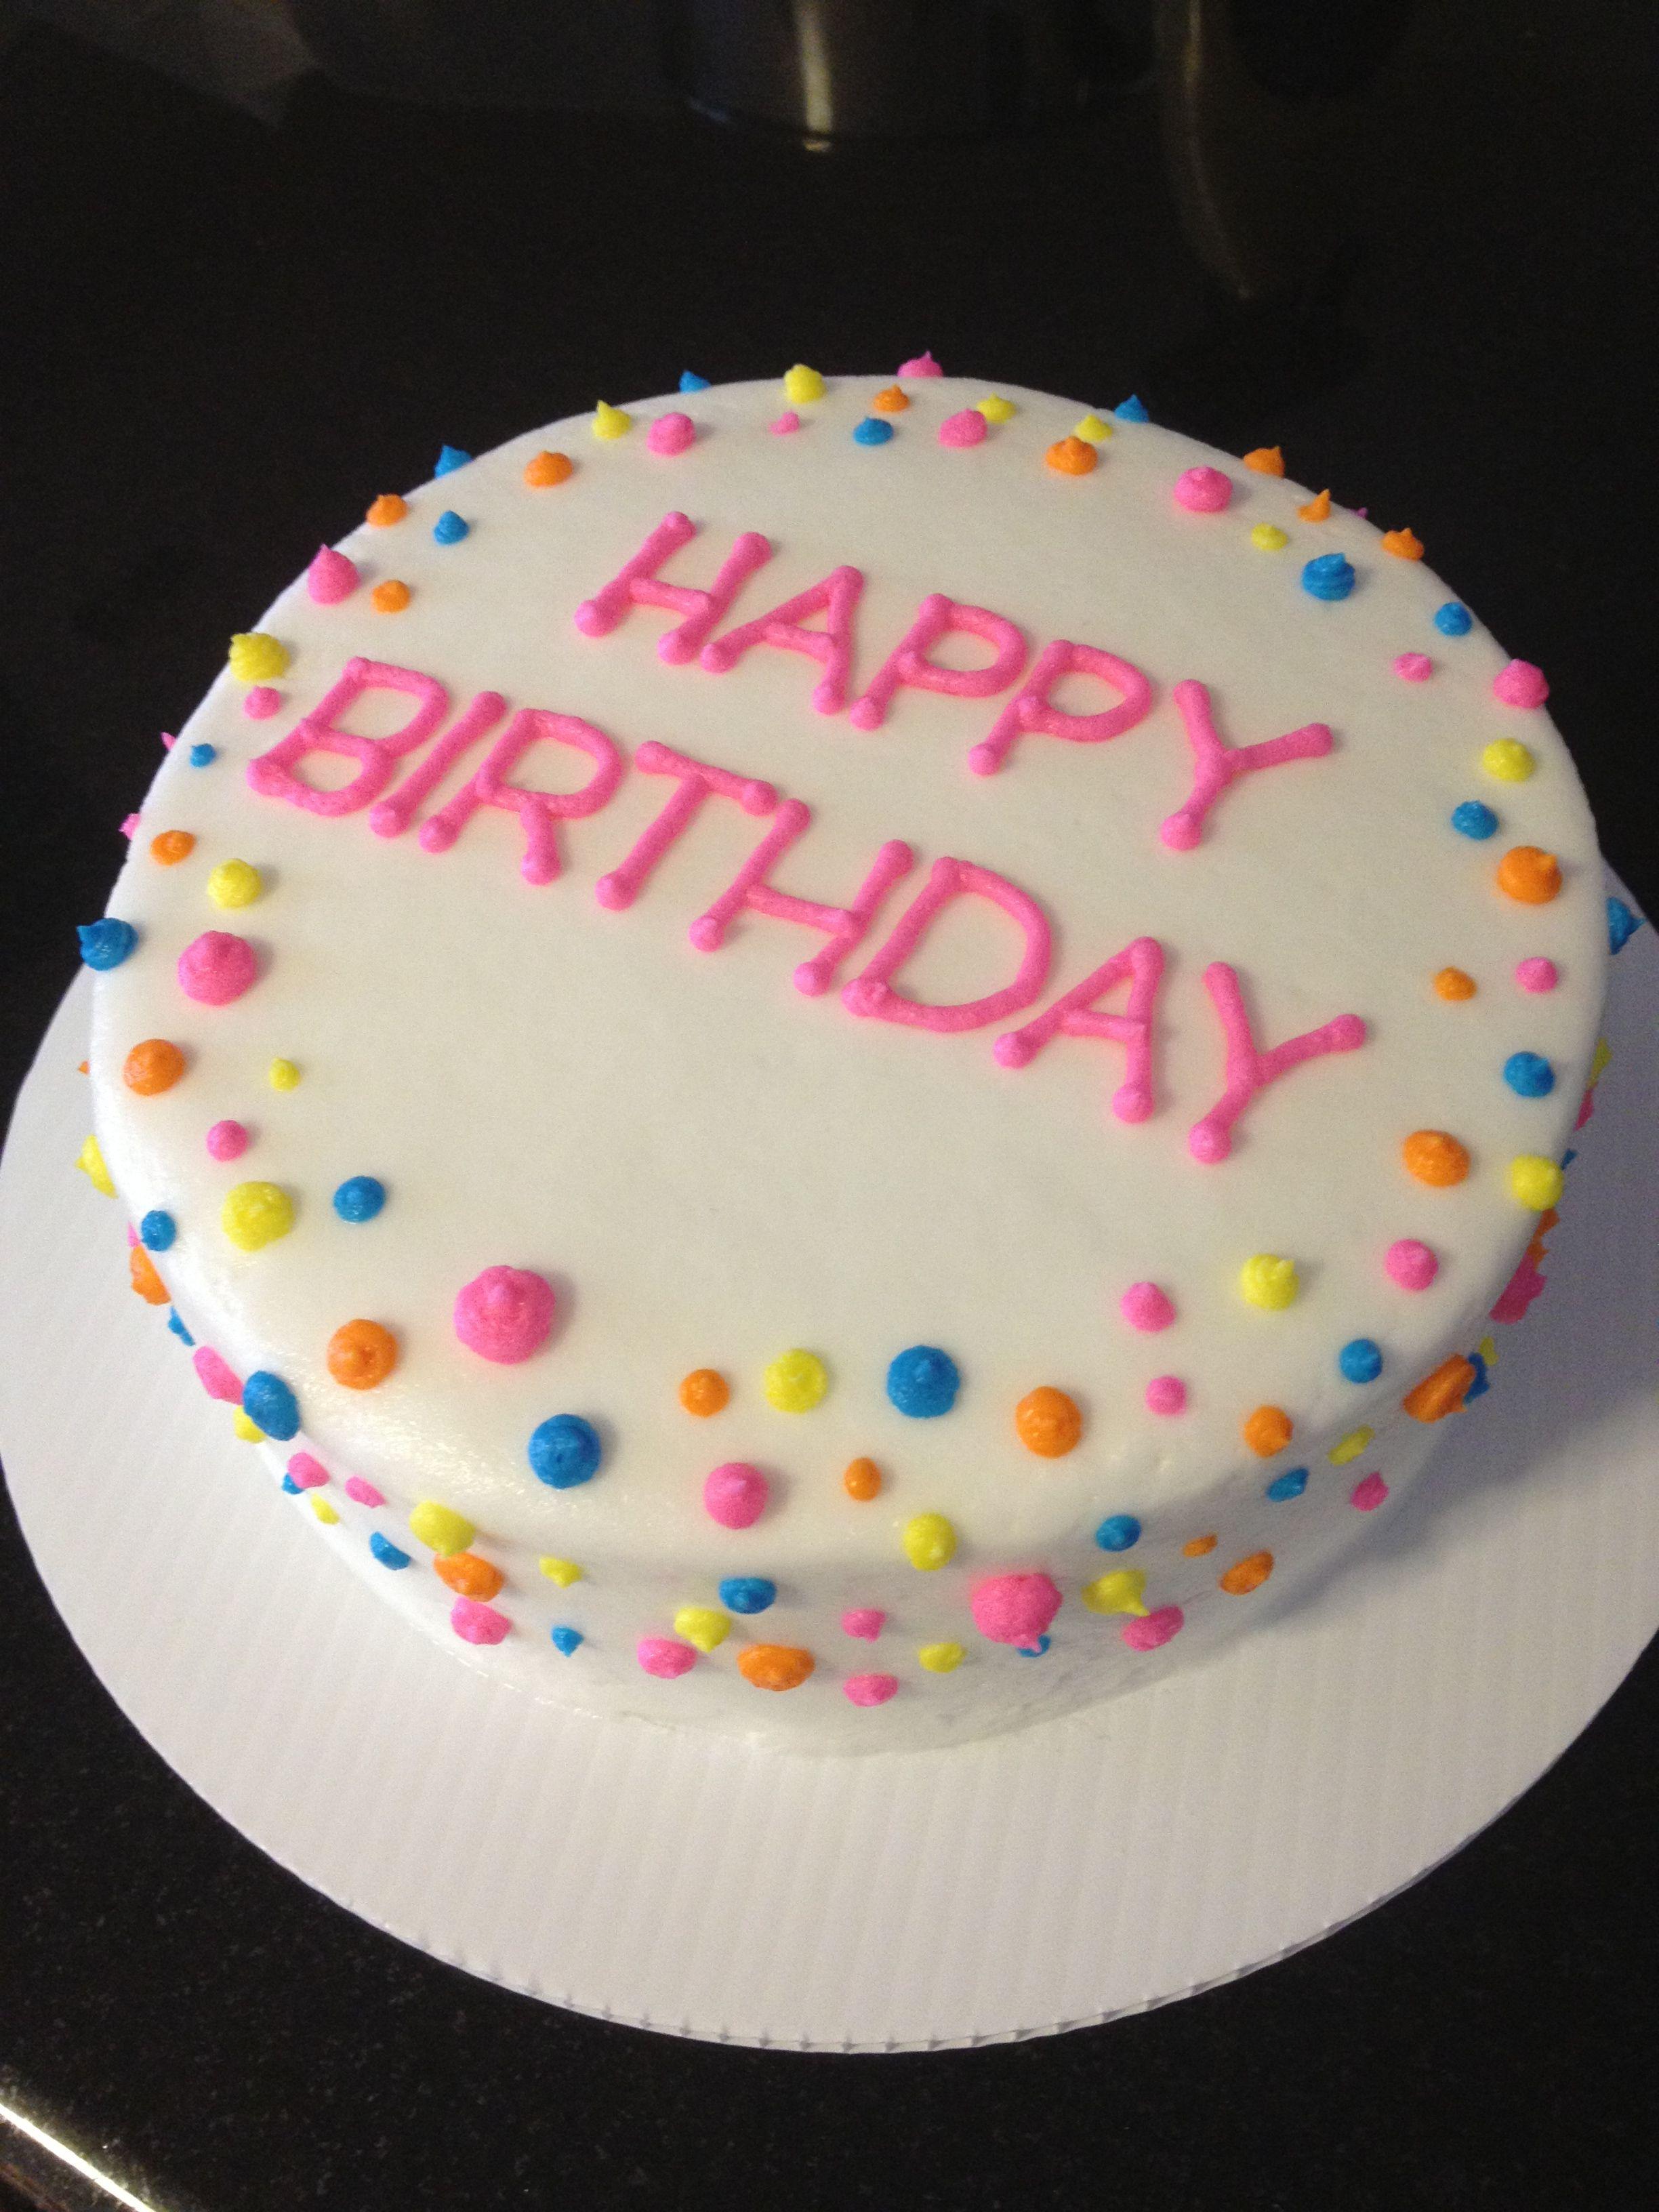 Polka Dot Birthday Cake | sweet treats | Birthday Cake, Cake ...